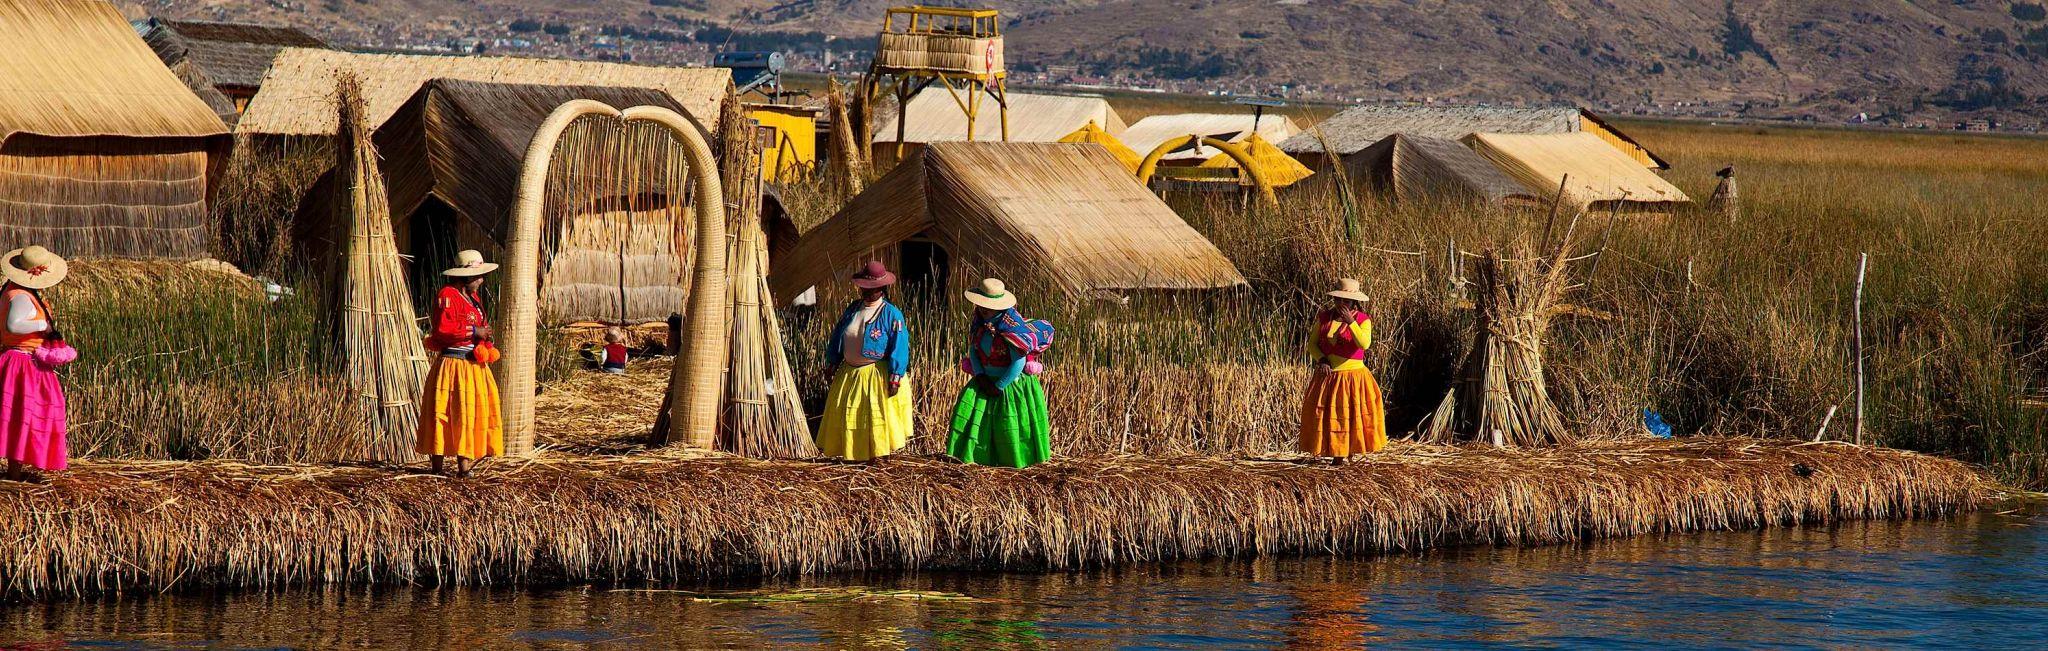 Peru & Machu Picchu Tours, Vacations & Travel Packages 2019-2020